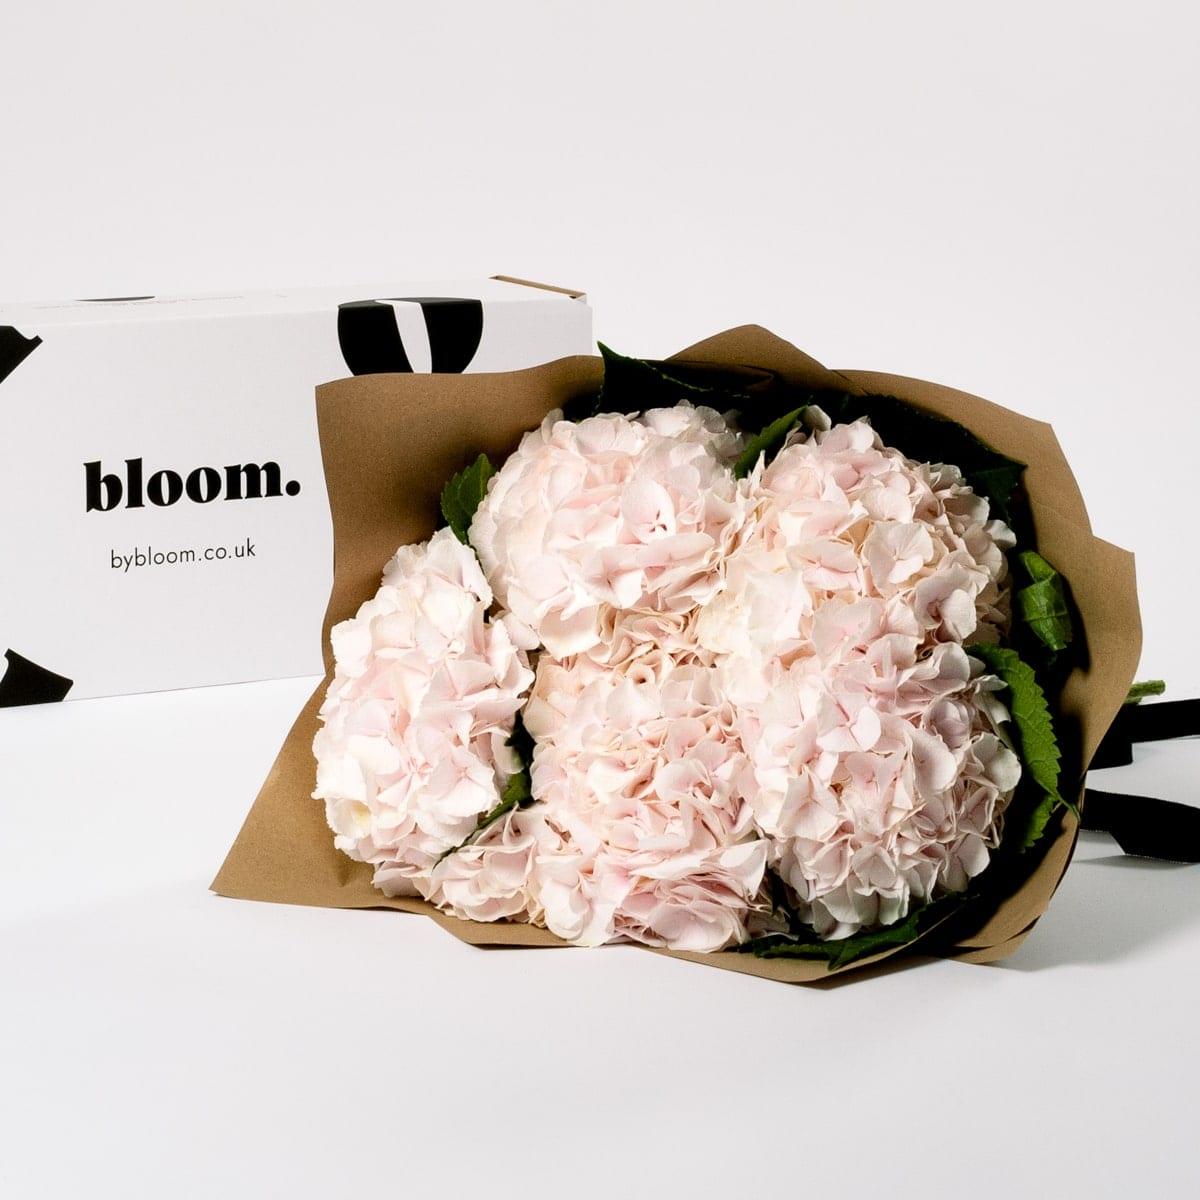 Bloom Flower Delivery | Ballet Slipper Pink Hydrangea